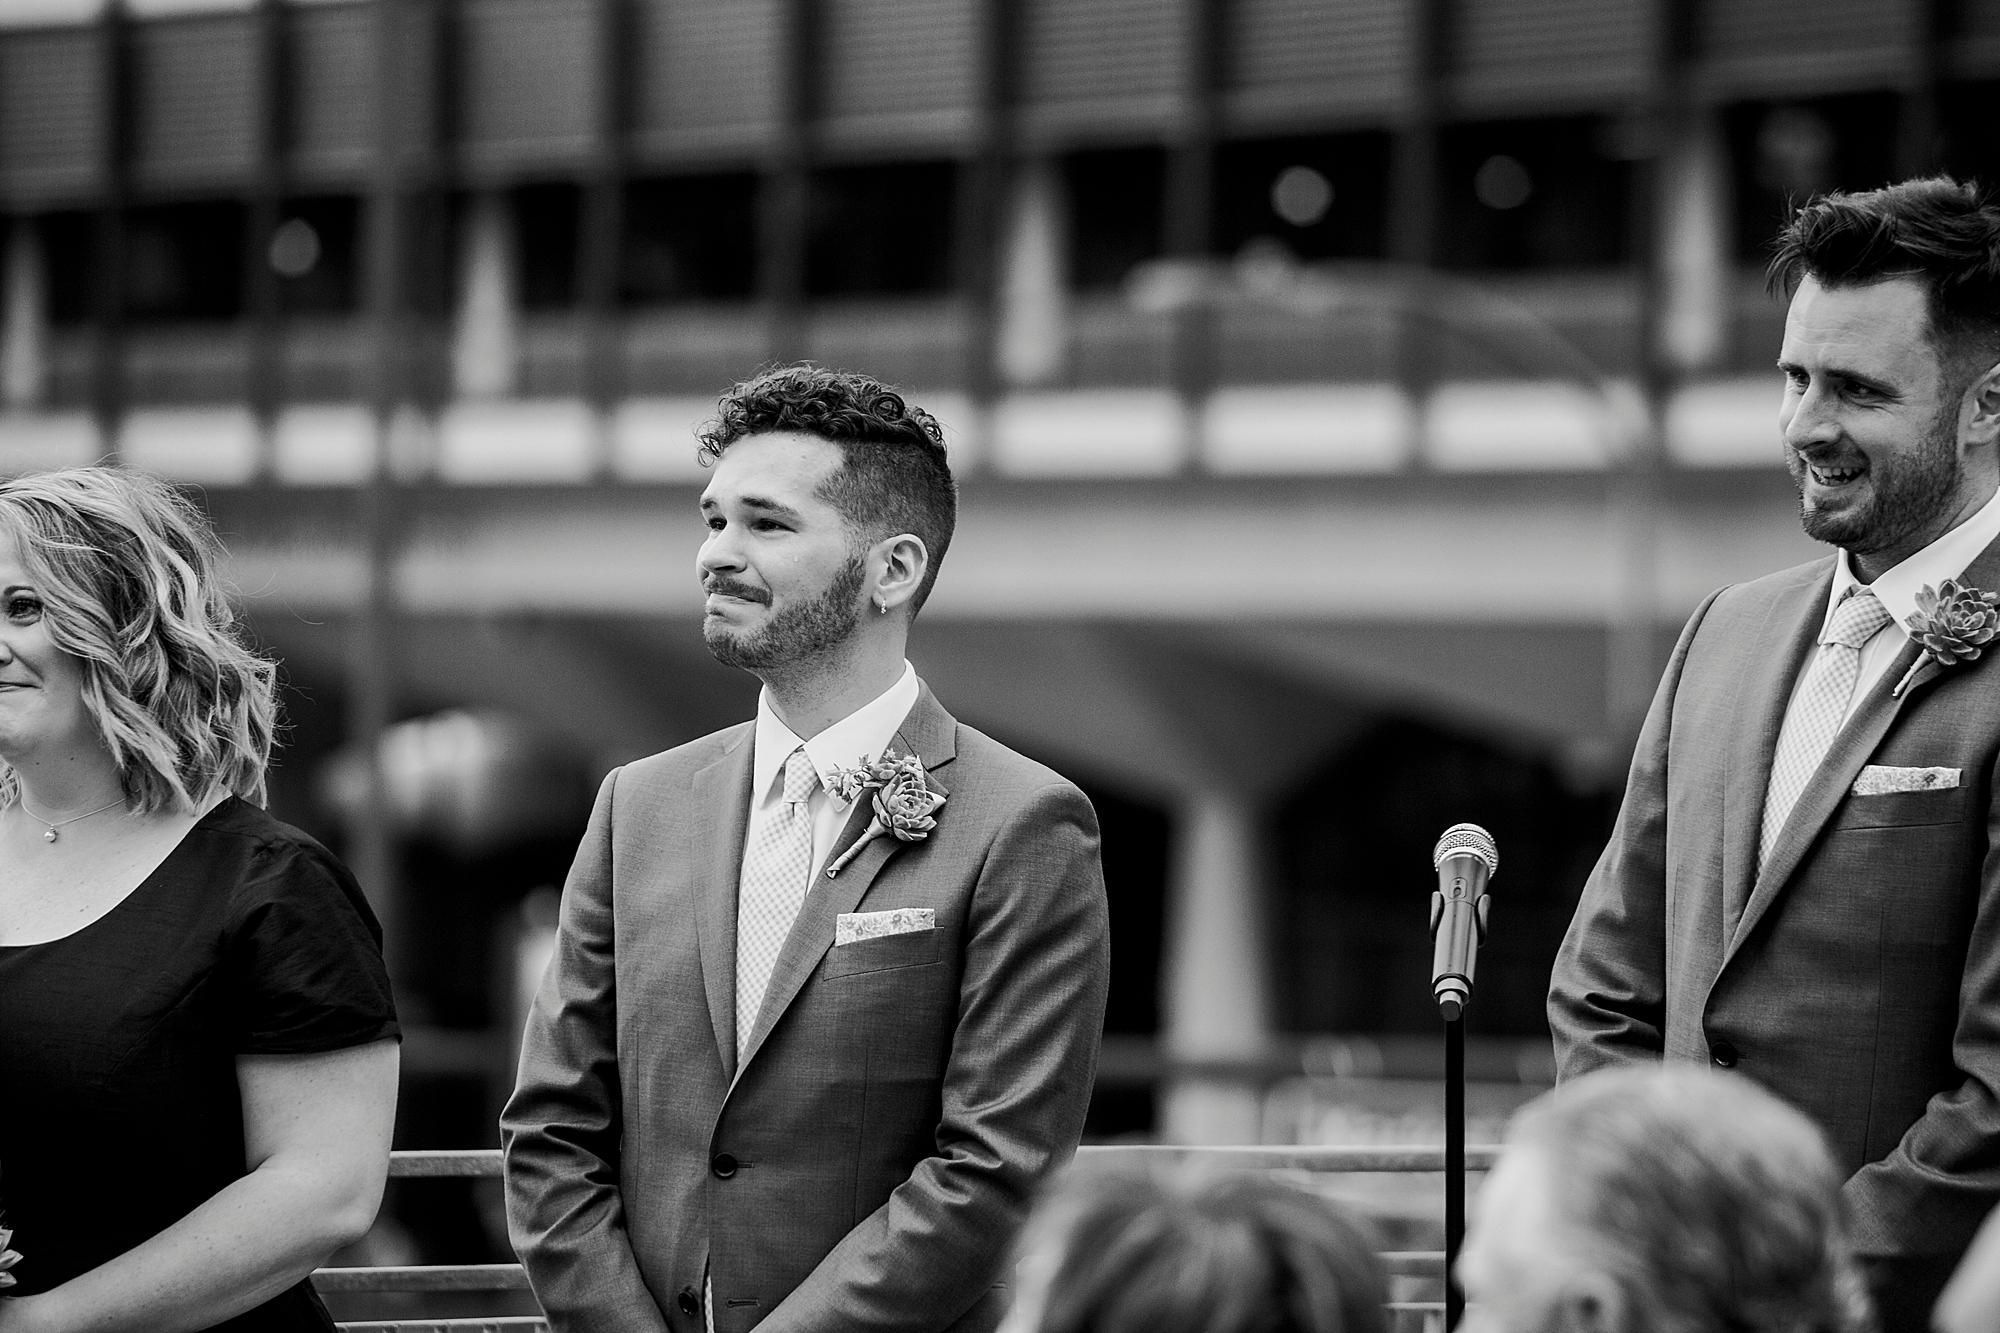 Dan_and_Byron_Love_by_Joe_Mac_Philadelphia_Wedding_LGBTQ_Photography_Gay_Independence_visitor_Center_96.JPG